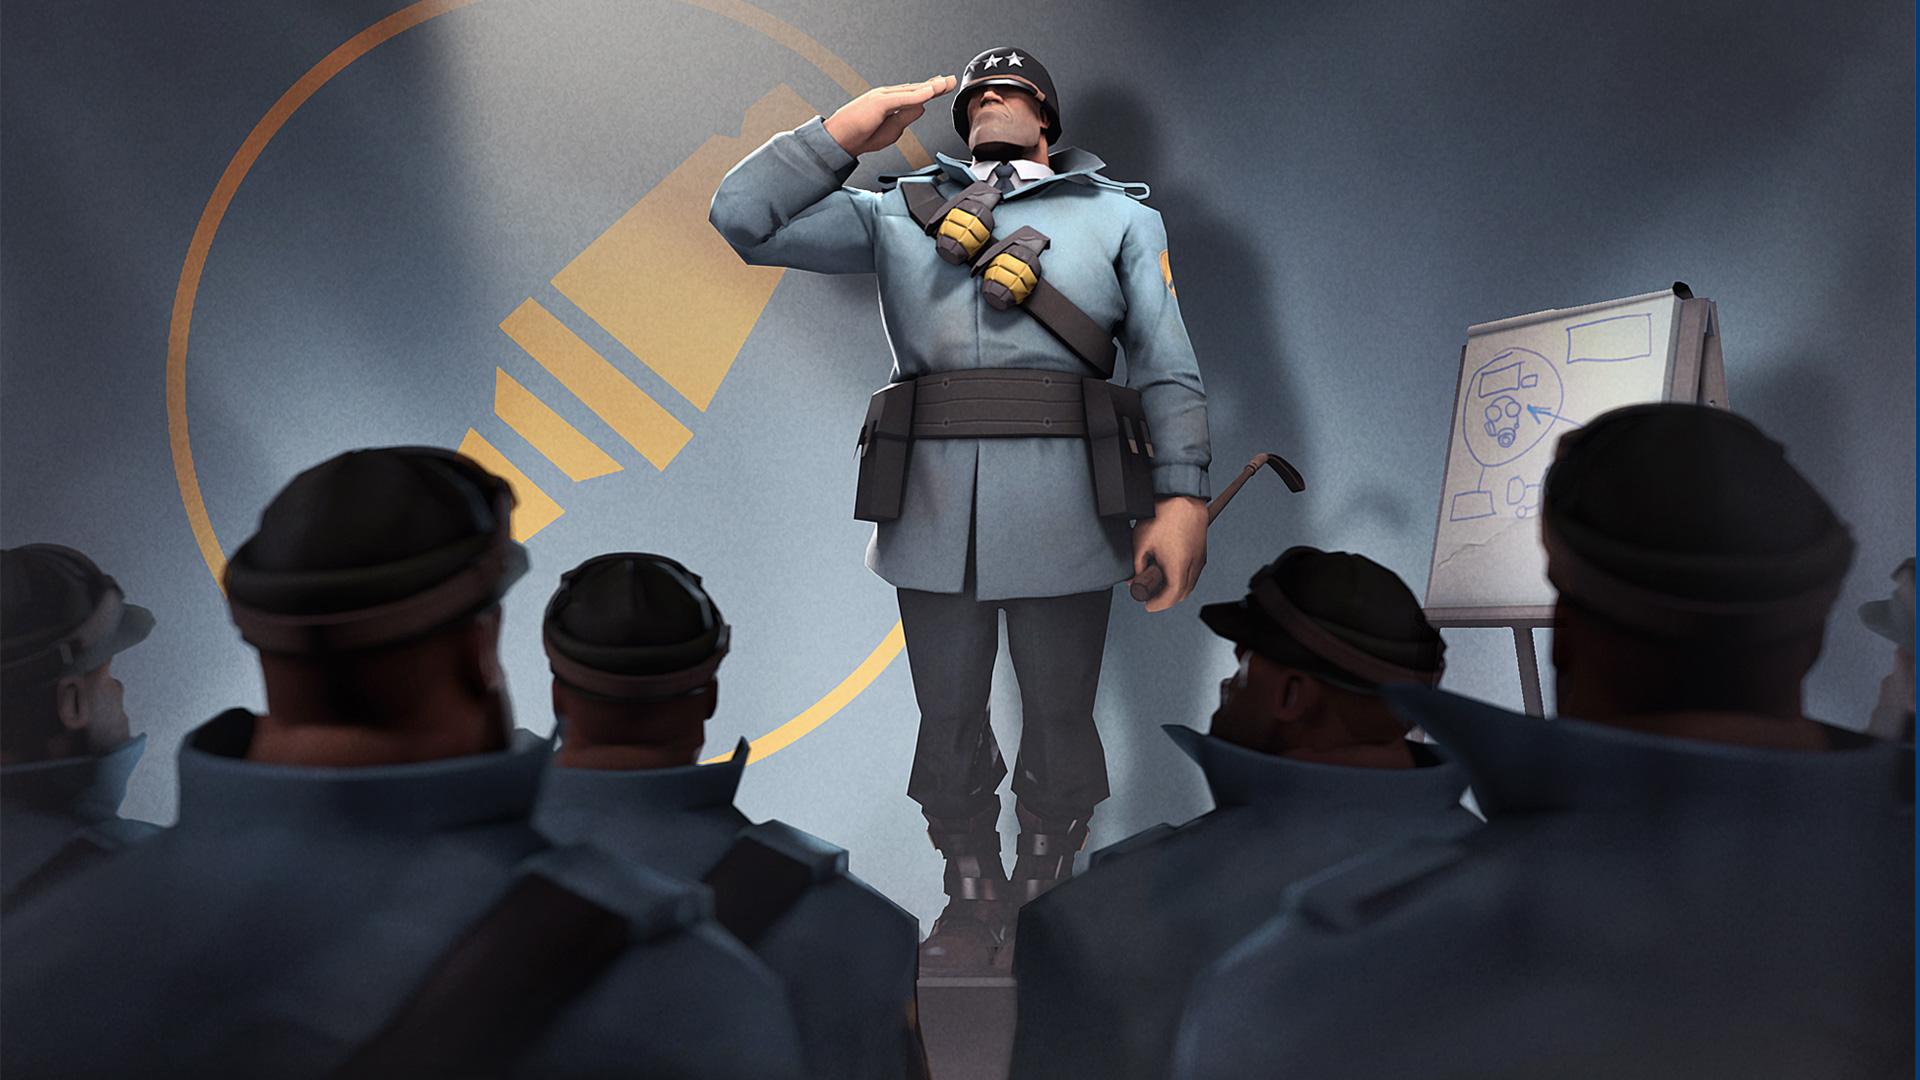 Team Fortress 2 wallpaper 17